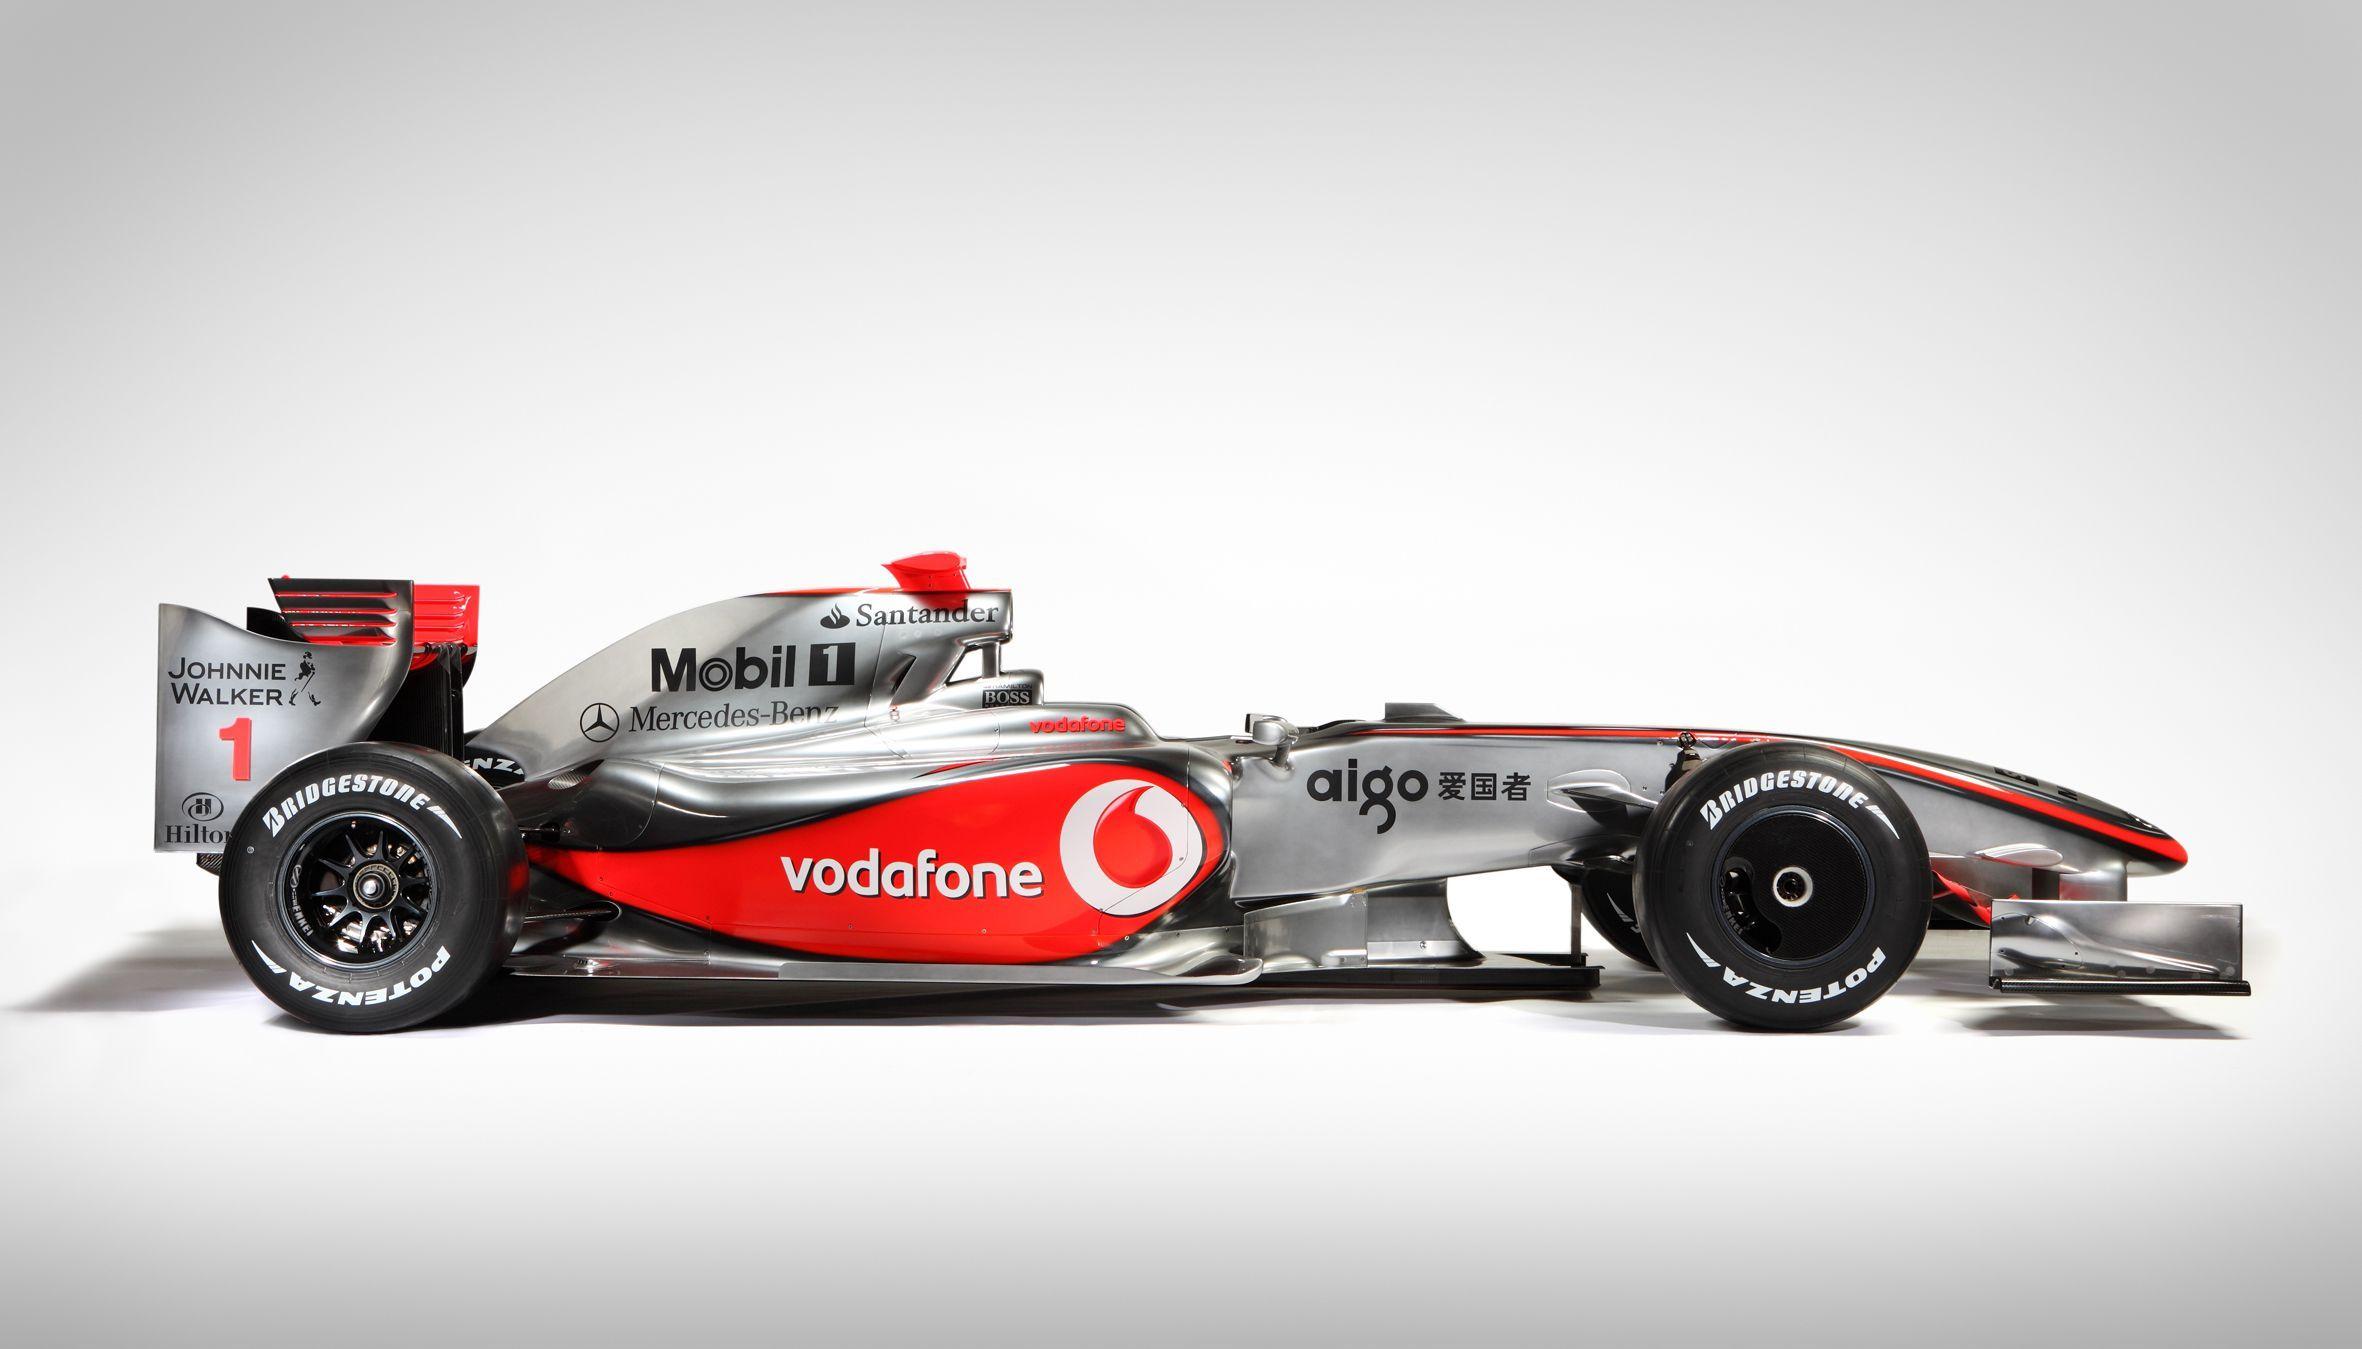 Mclaren mercedes formula 2362 1349 formula 1 for Mercedes benz formula 1